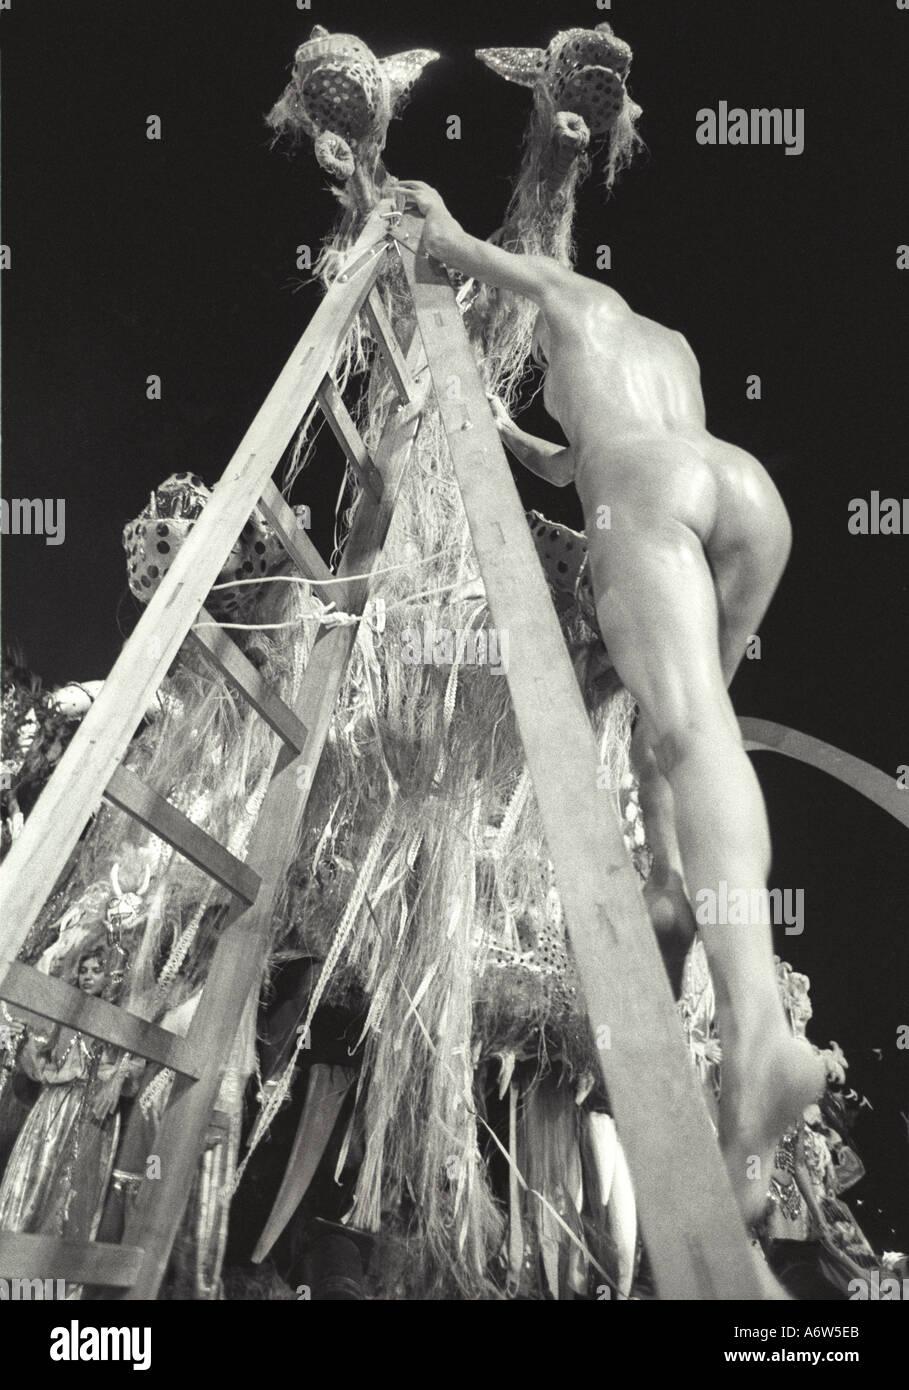 ausgefallene sexpraktiken karneval nude